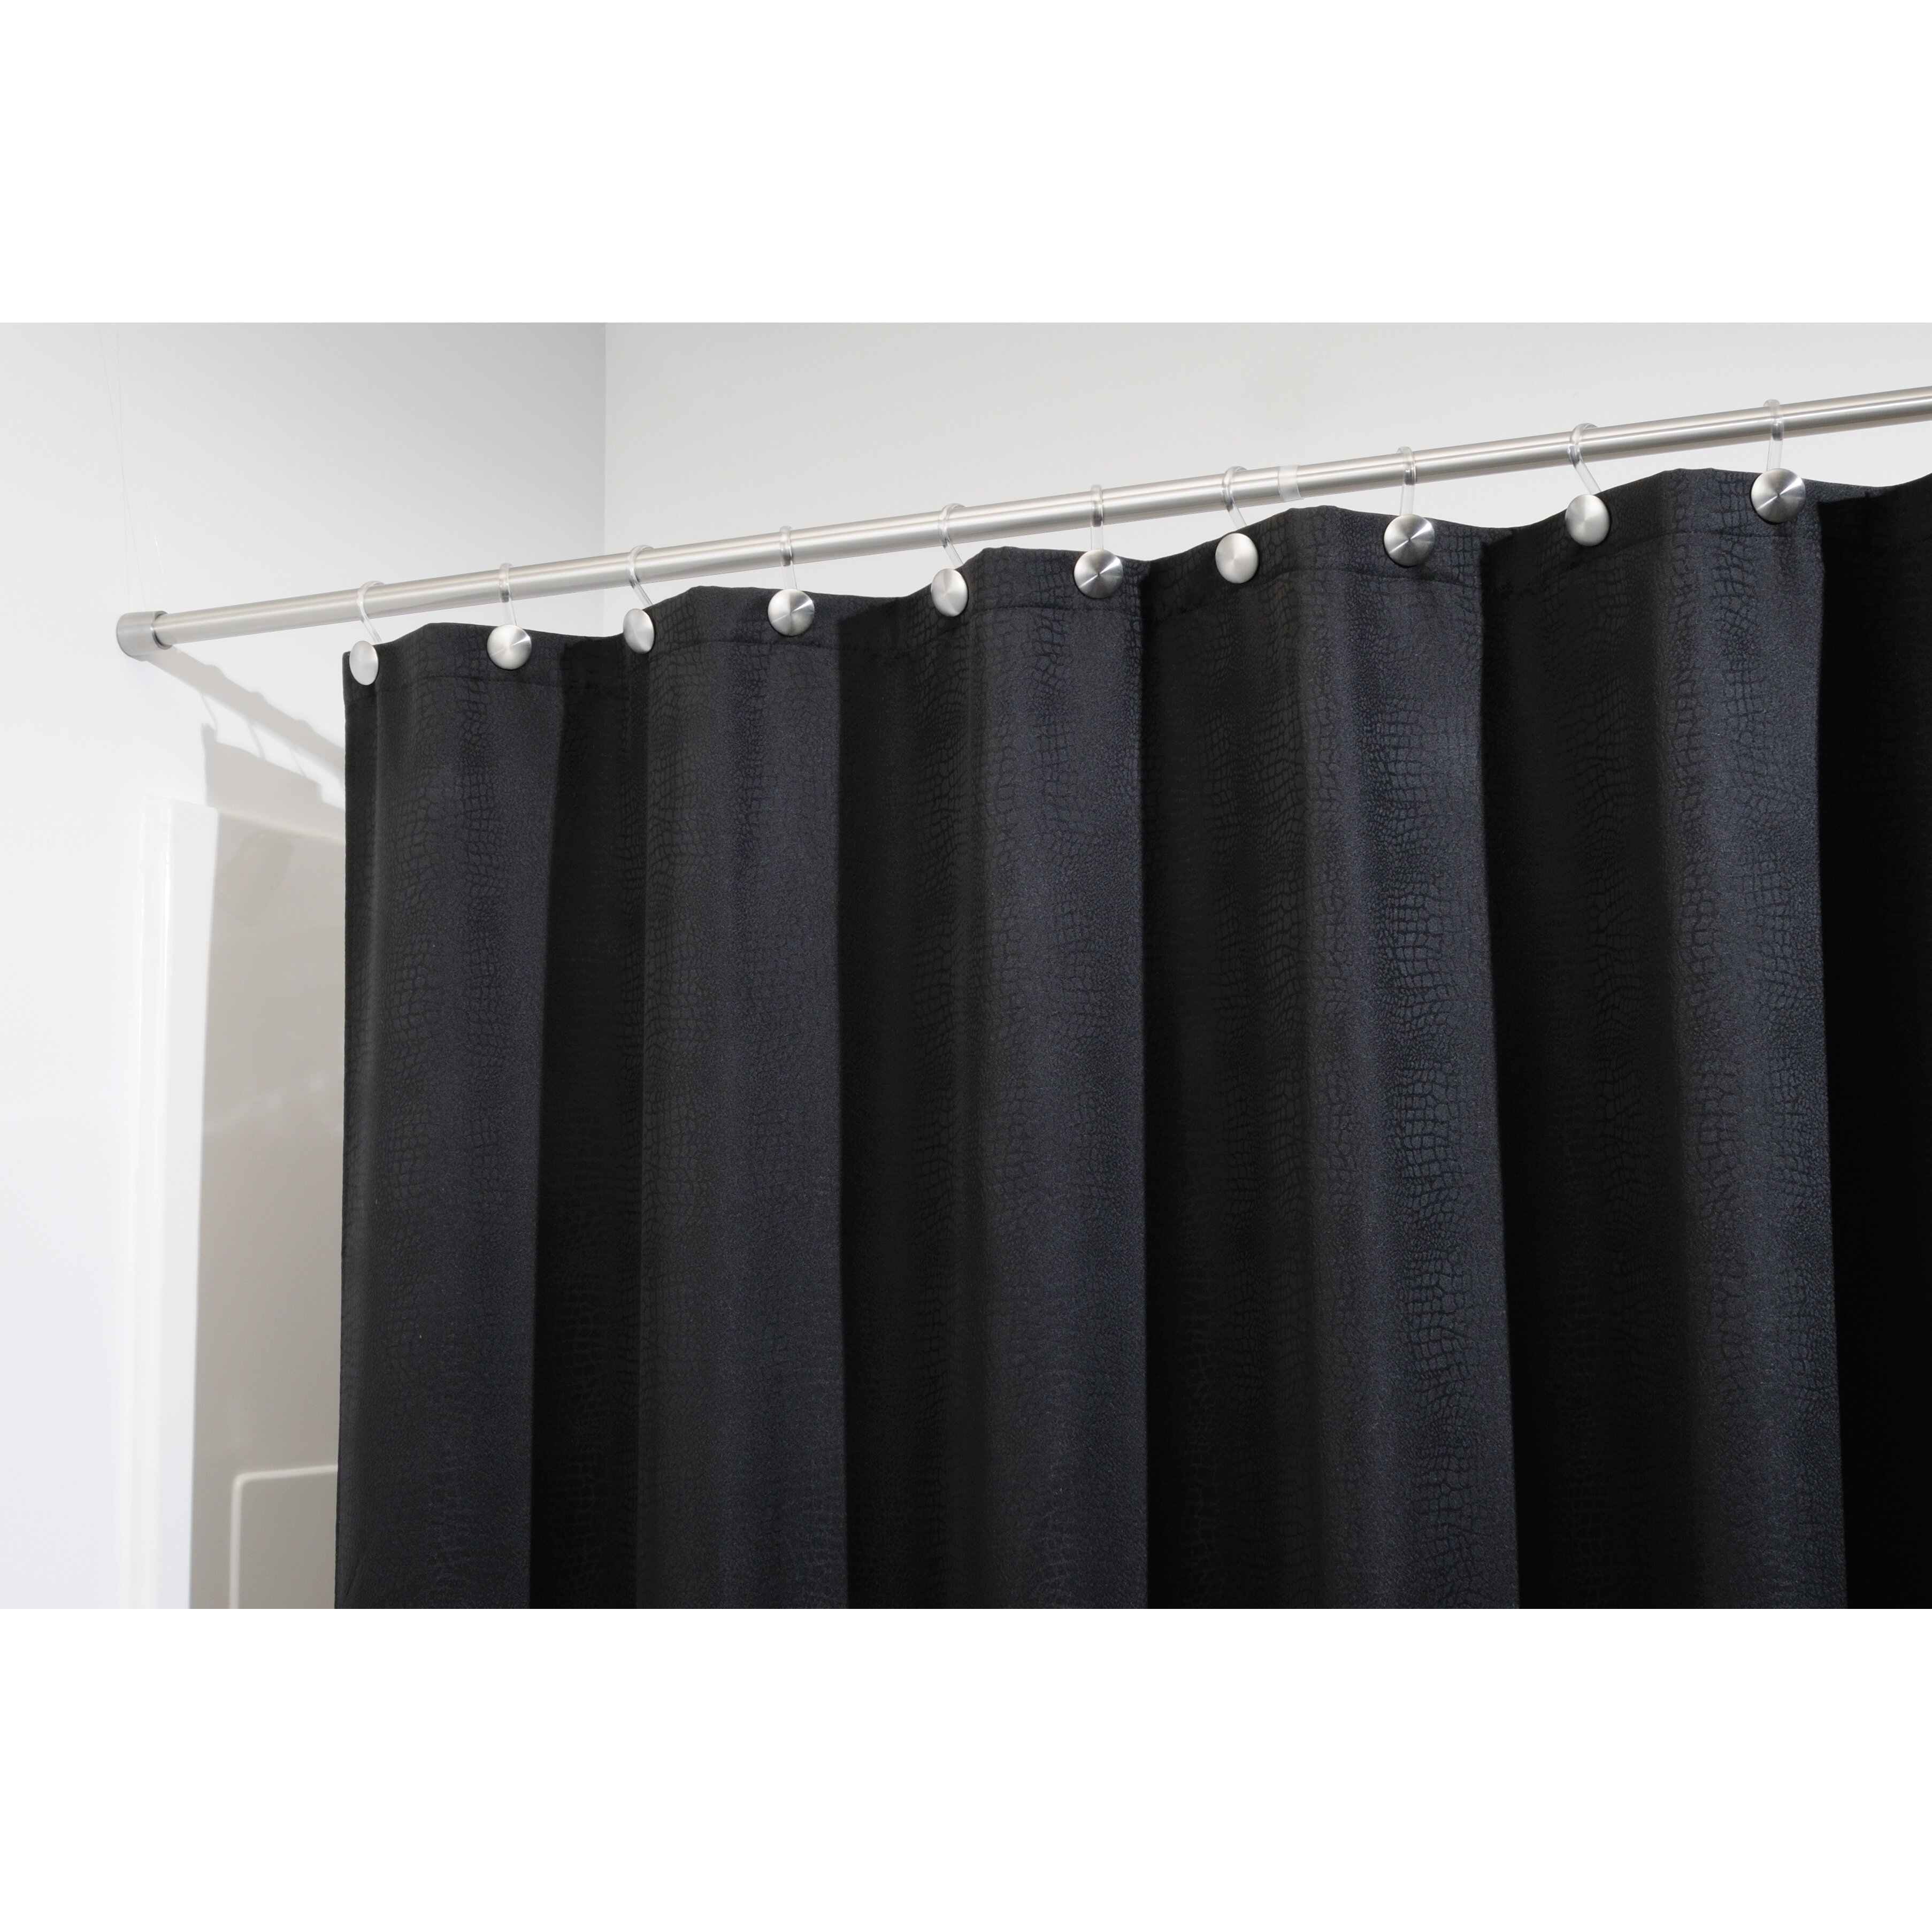 InterDesign Forma Small Adjustable Straight Tension Shower